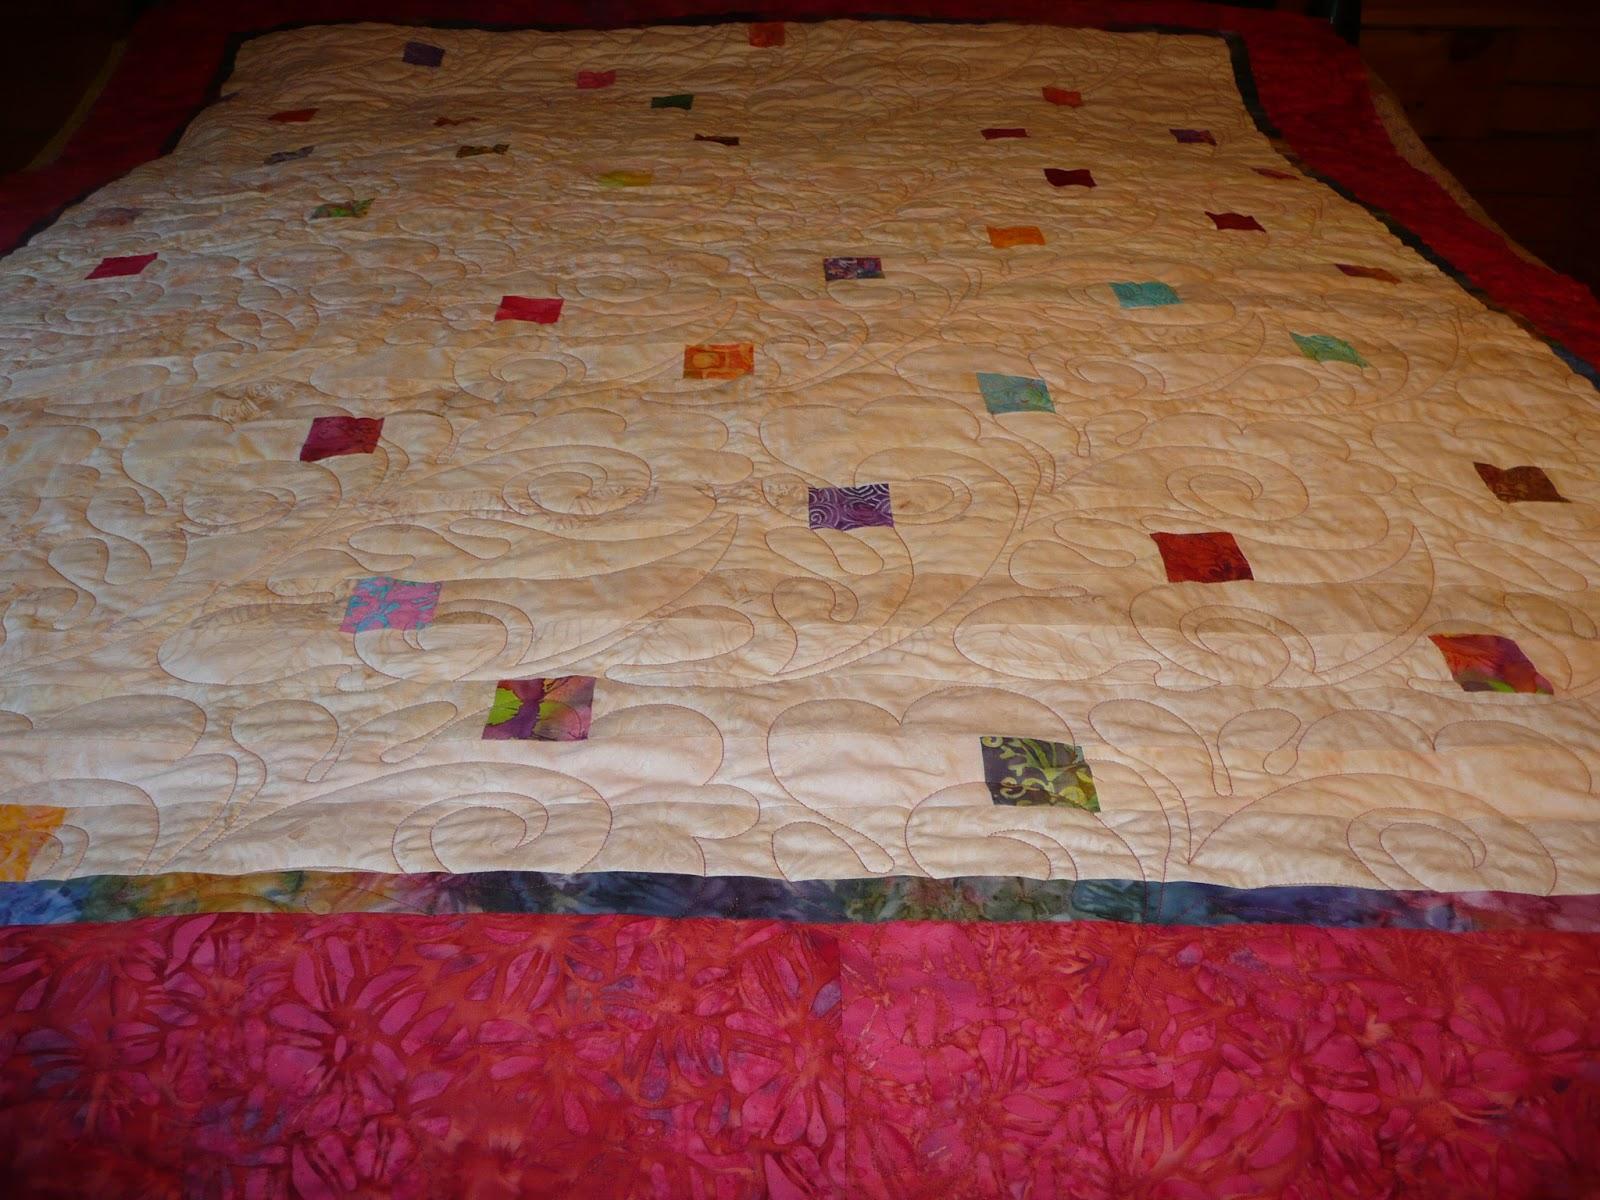 Acorn Ridge Quilting: Mary's Jelly Roll Race Quilt : jelly roll race quilt pattern - Adamdwight.com